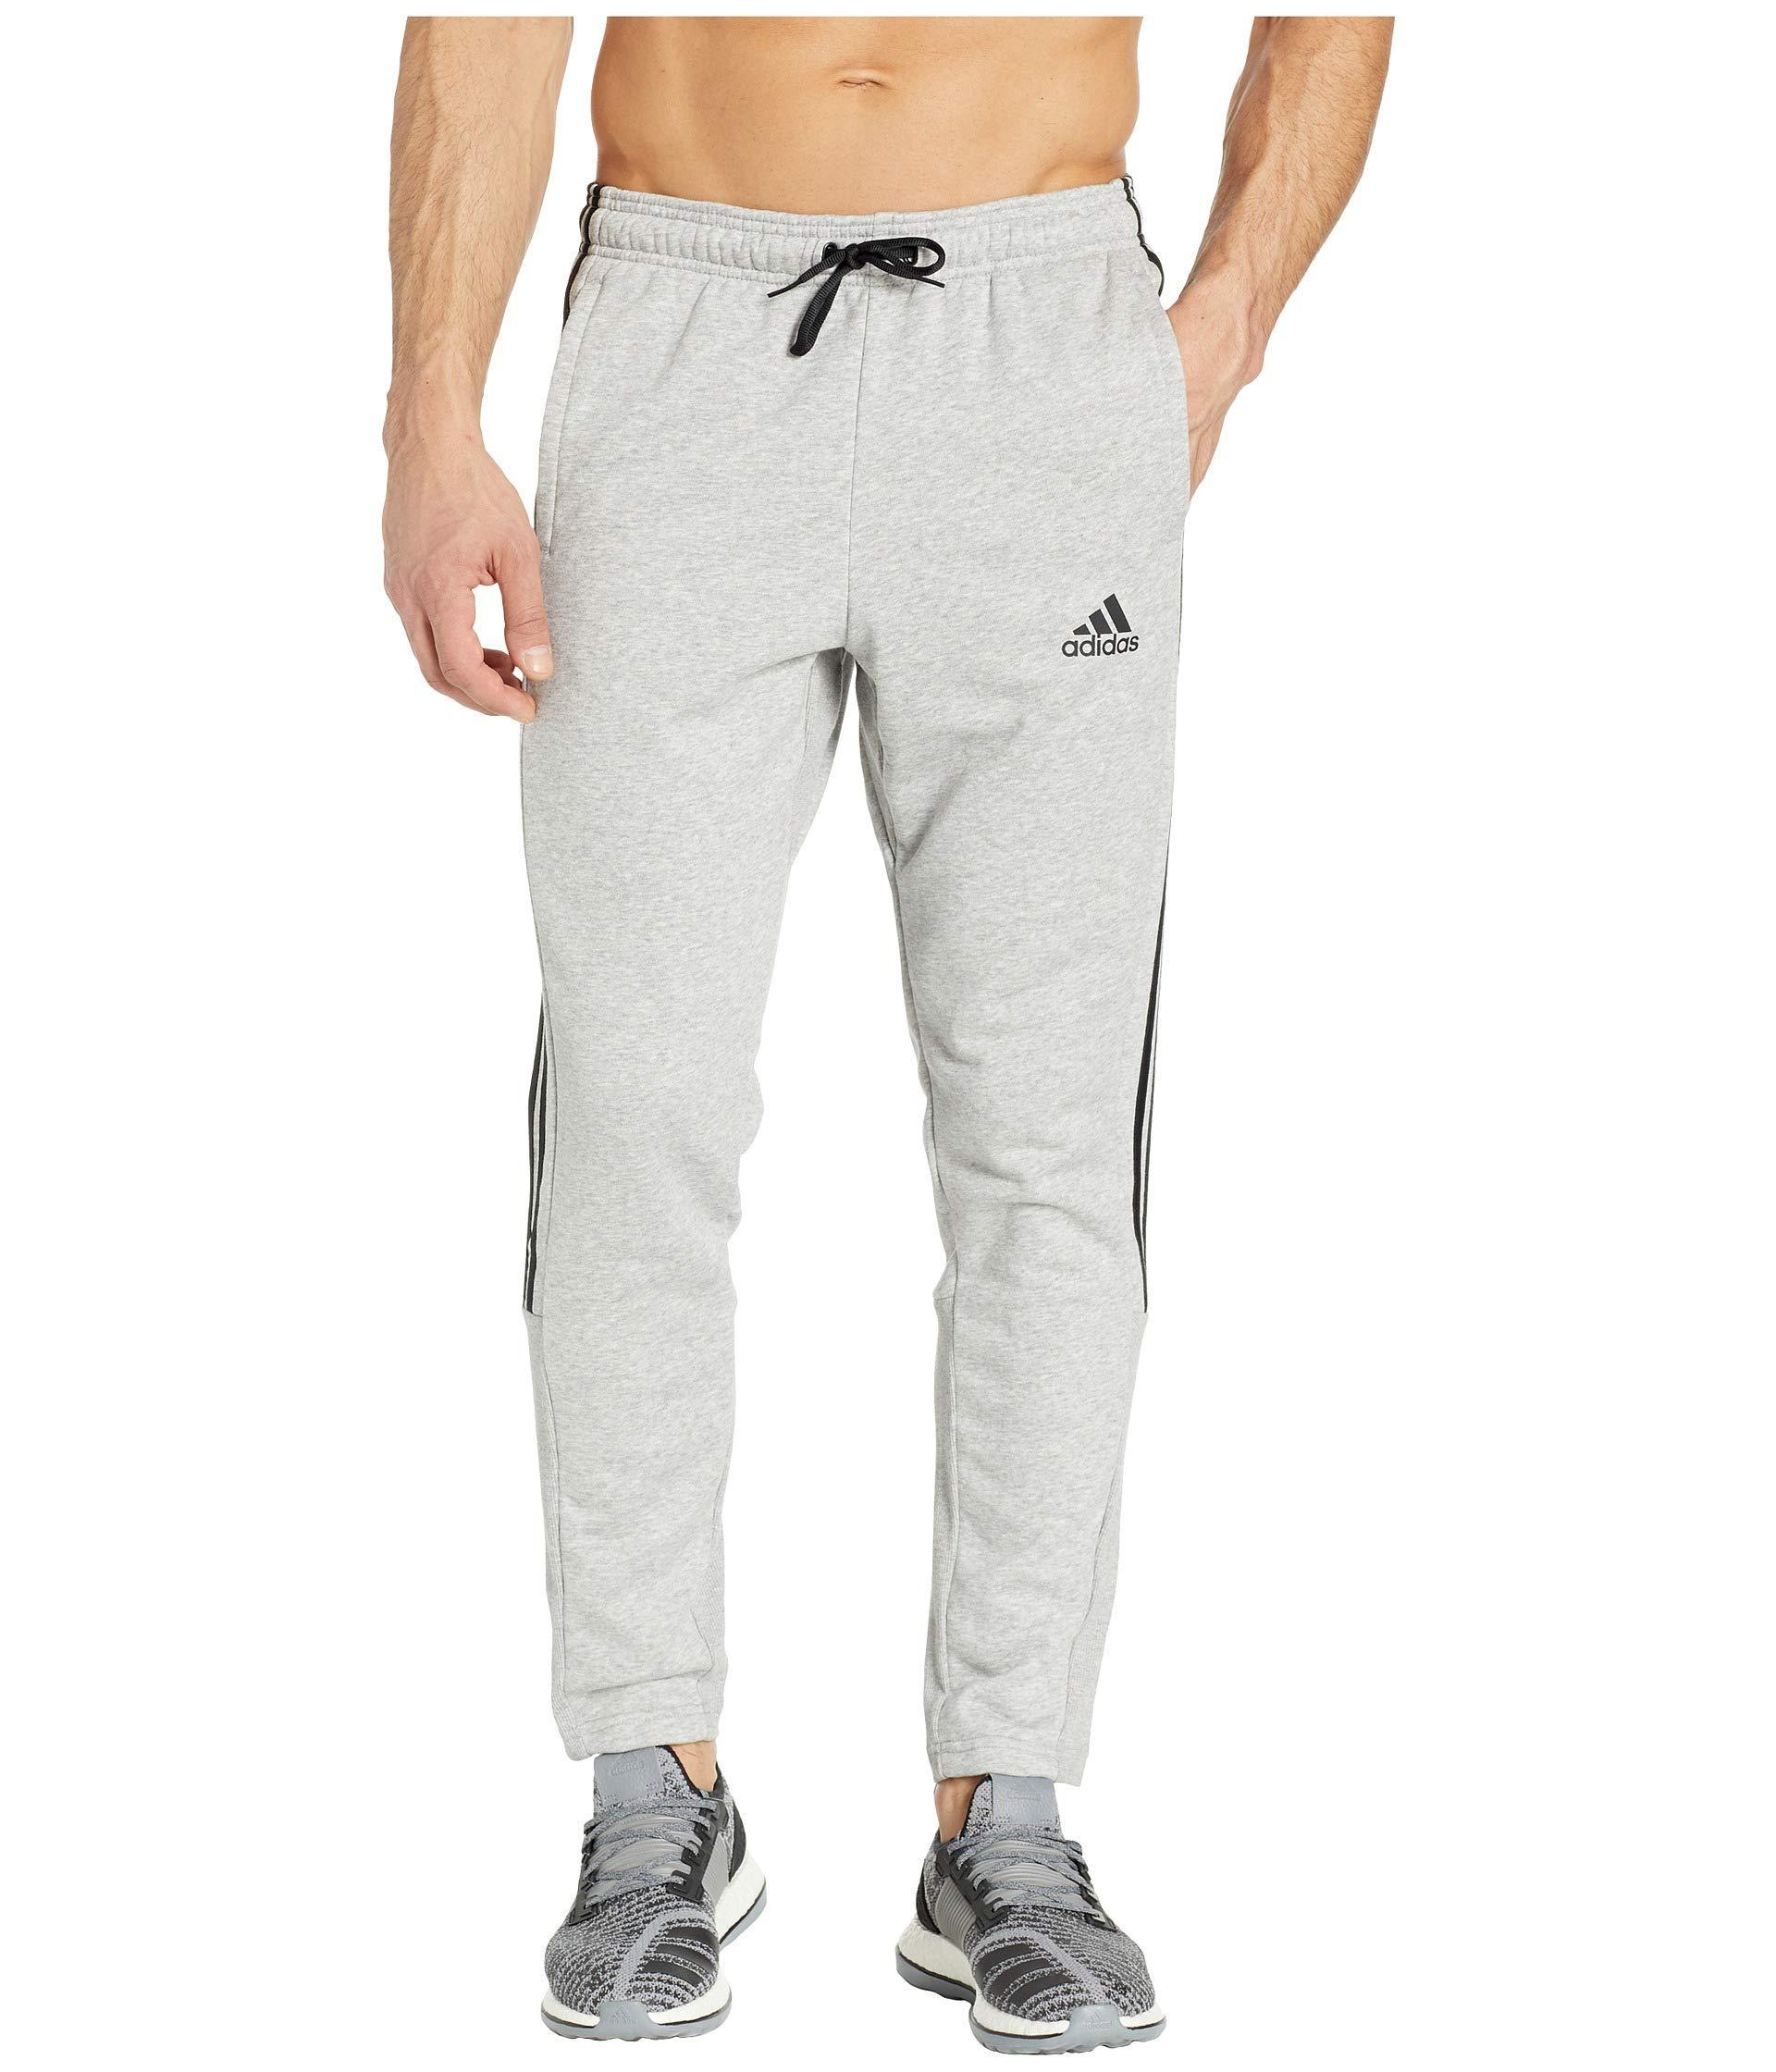 Adidas Gray Must Have 3 stripe Pants (blackwhite) Men's Workout for men